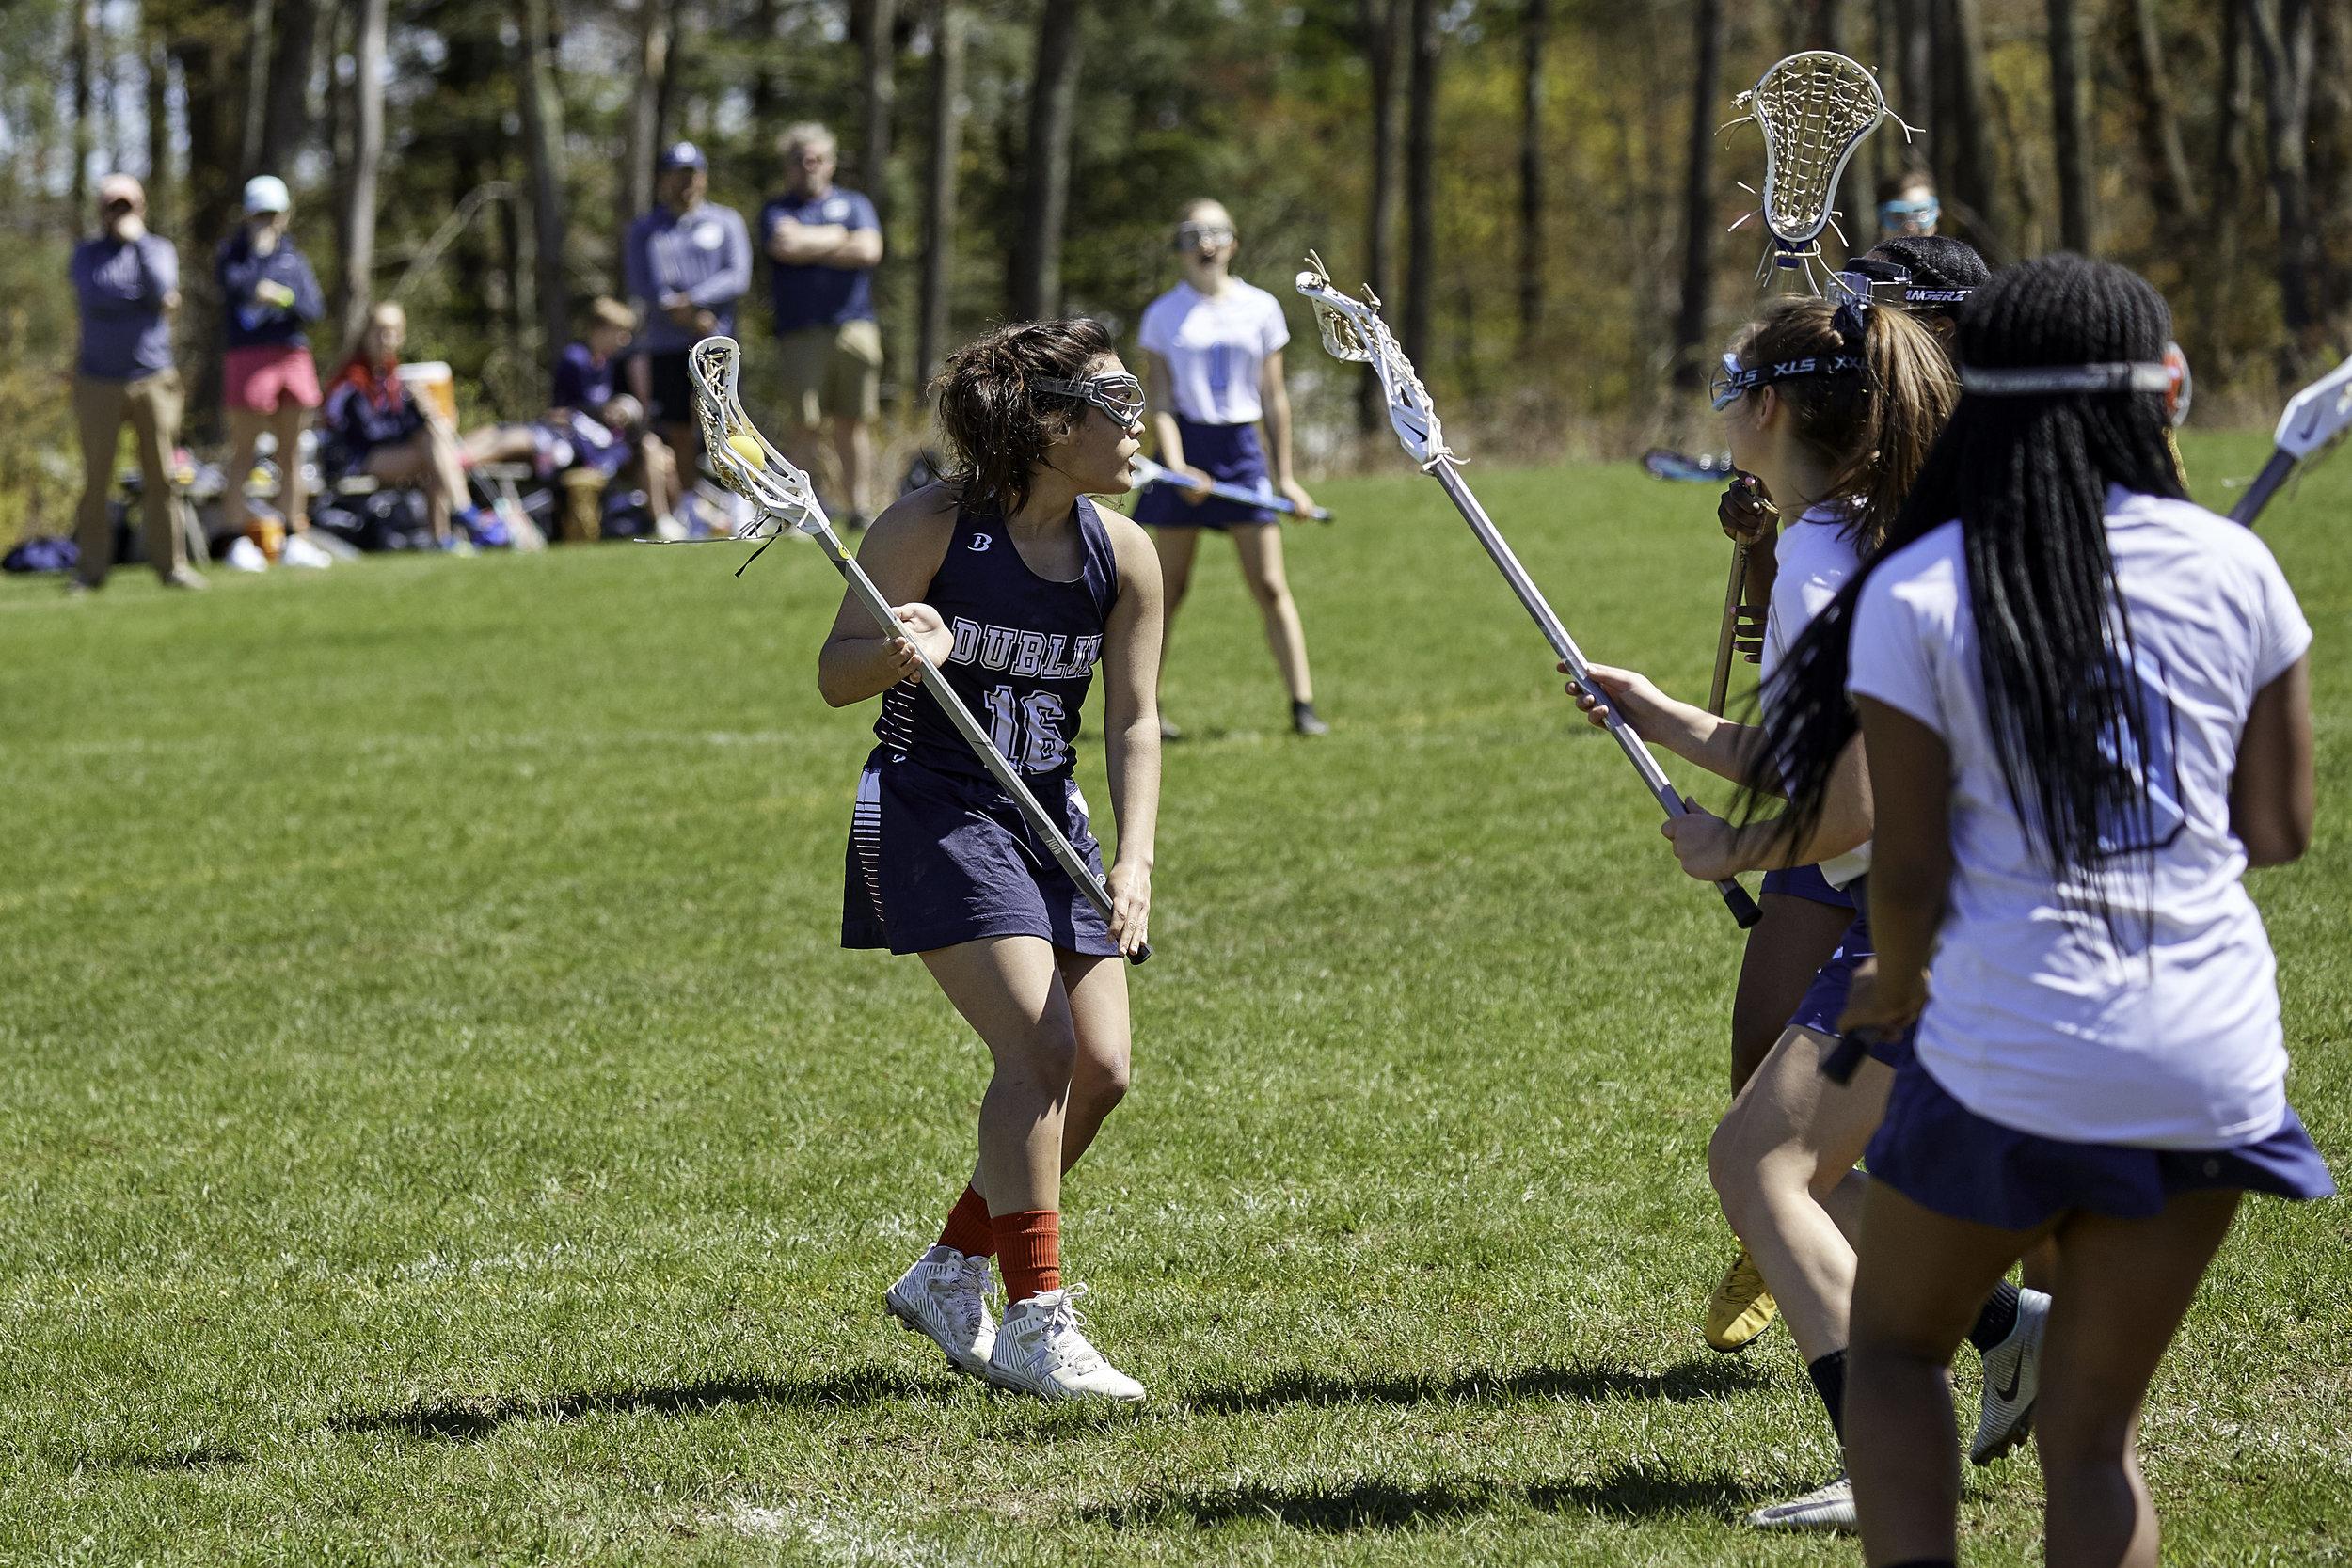 Girls Lacrosse vs. Stoneleigh Burnham School - May 11, 2019 - May 10, 2019193222.jpg